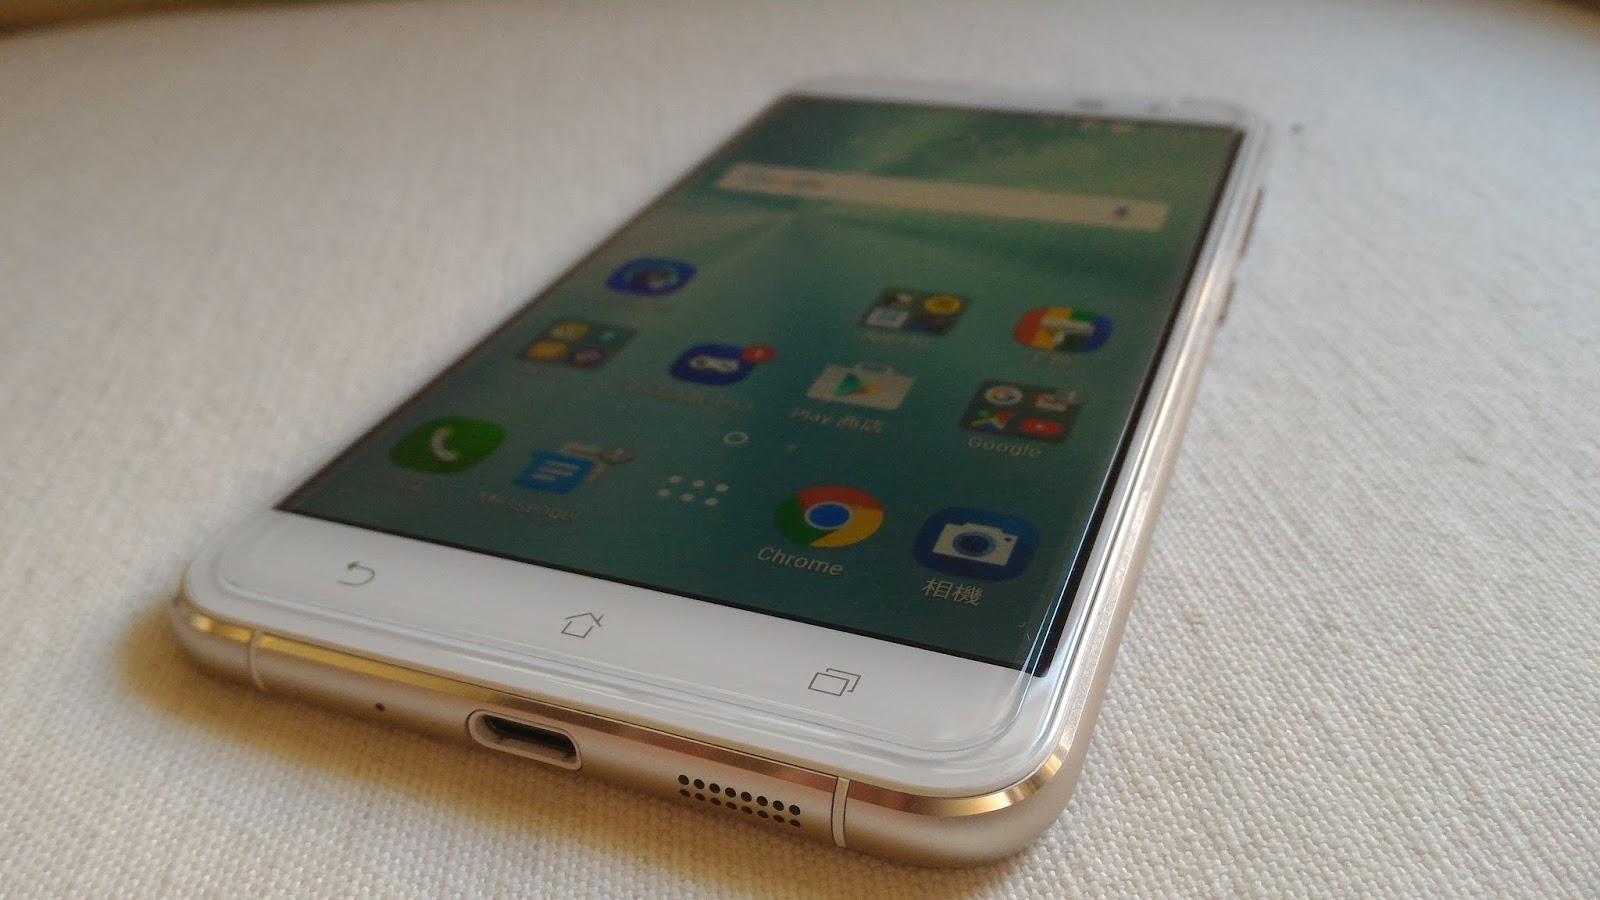 P 20170126 162559 - [開箱] 平價奢華 Zenfone 3 ZE552KL 月光白 4G/64G,外型大進化、CP值破表!